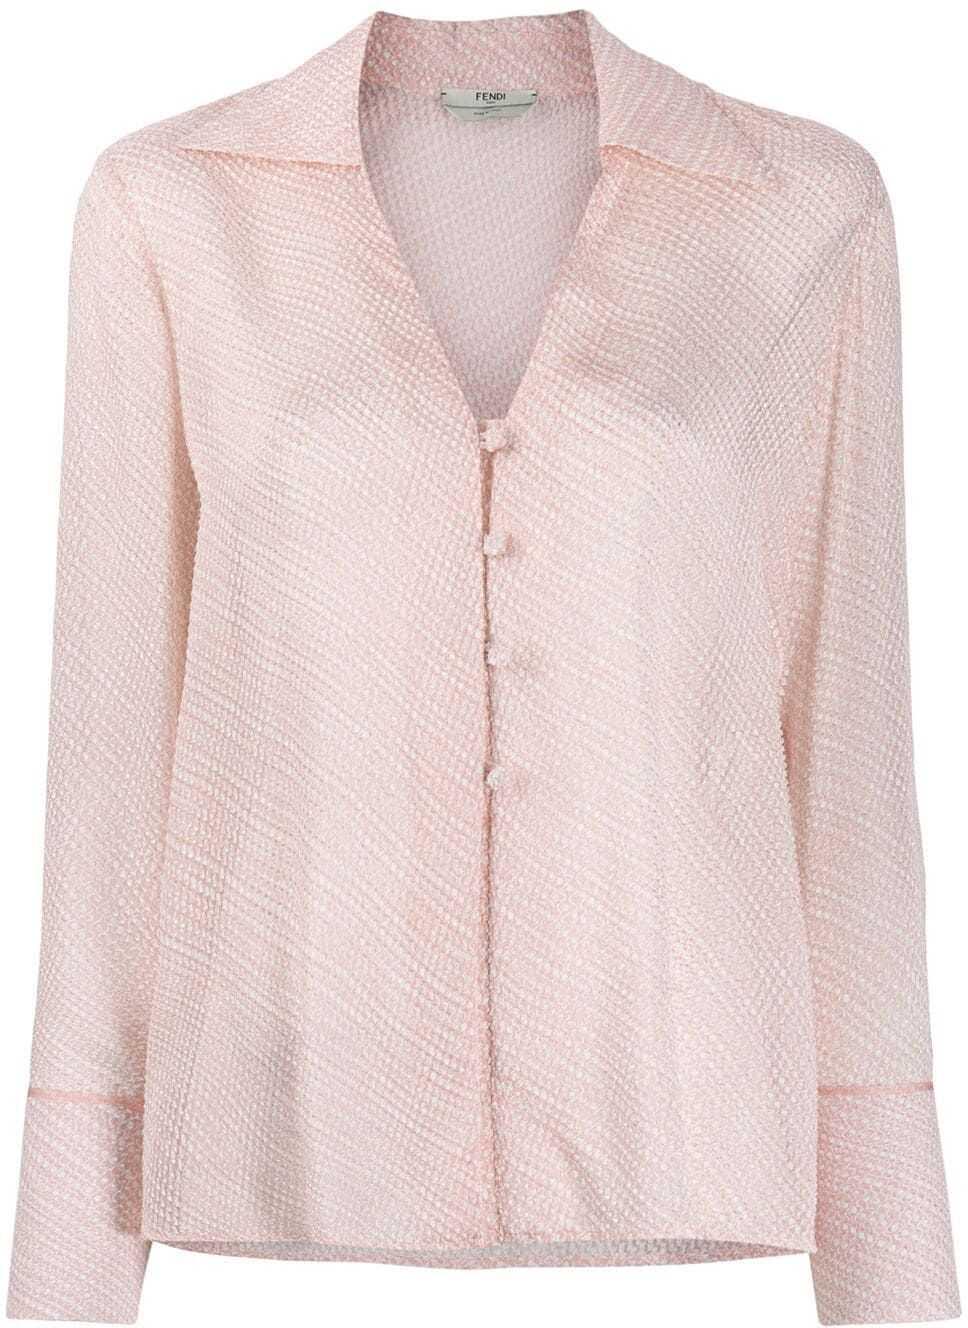 Fendi Silk Shirt thumbnail